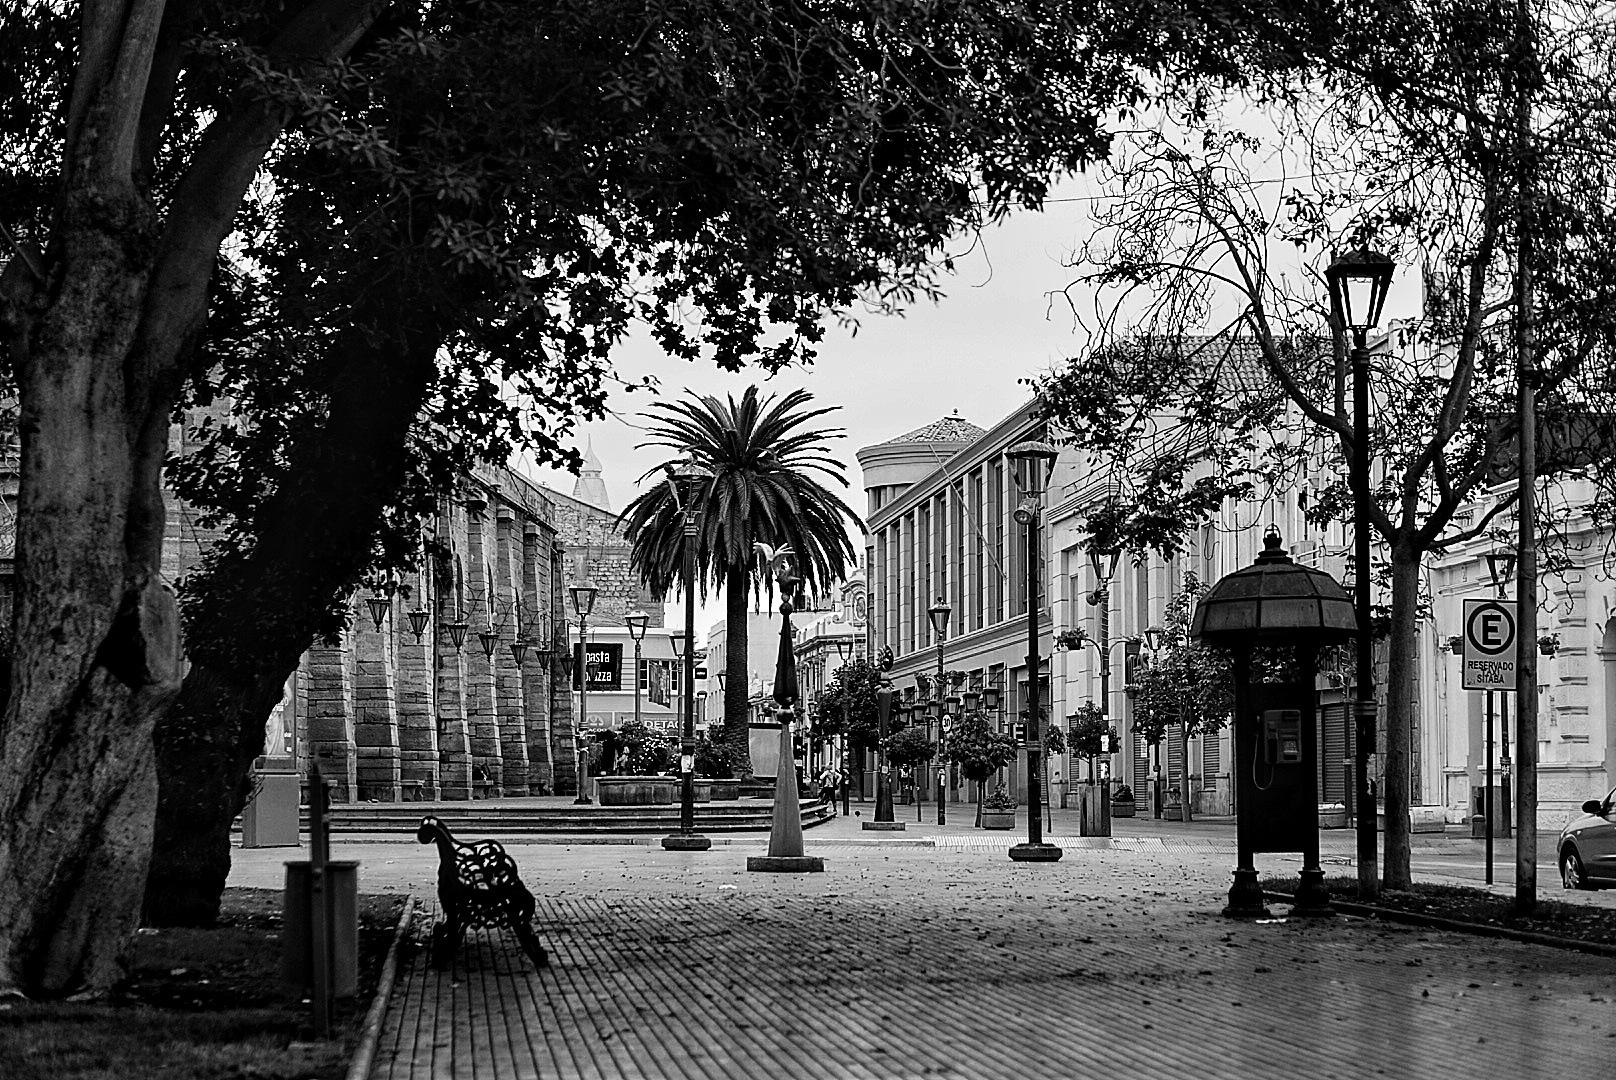 Otoño en La Serena by Marcelo Lorca